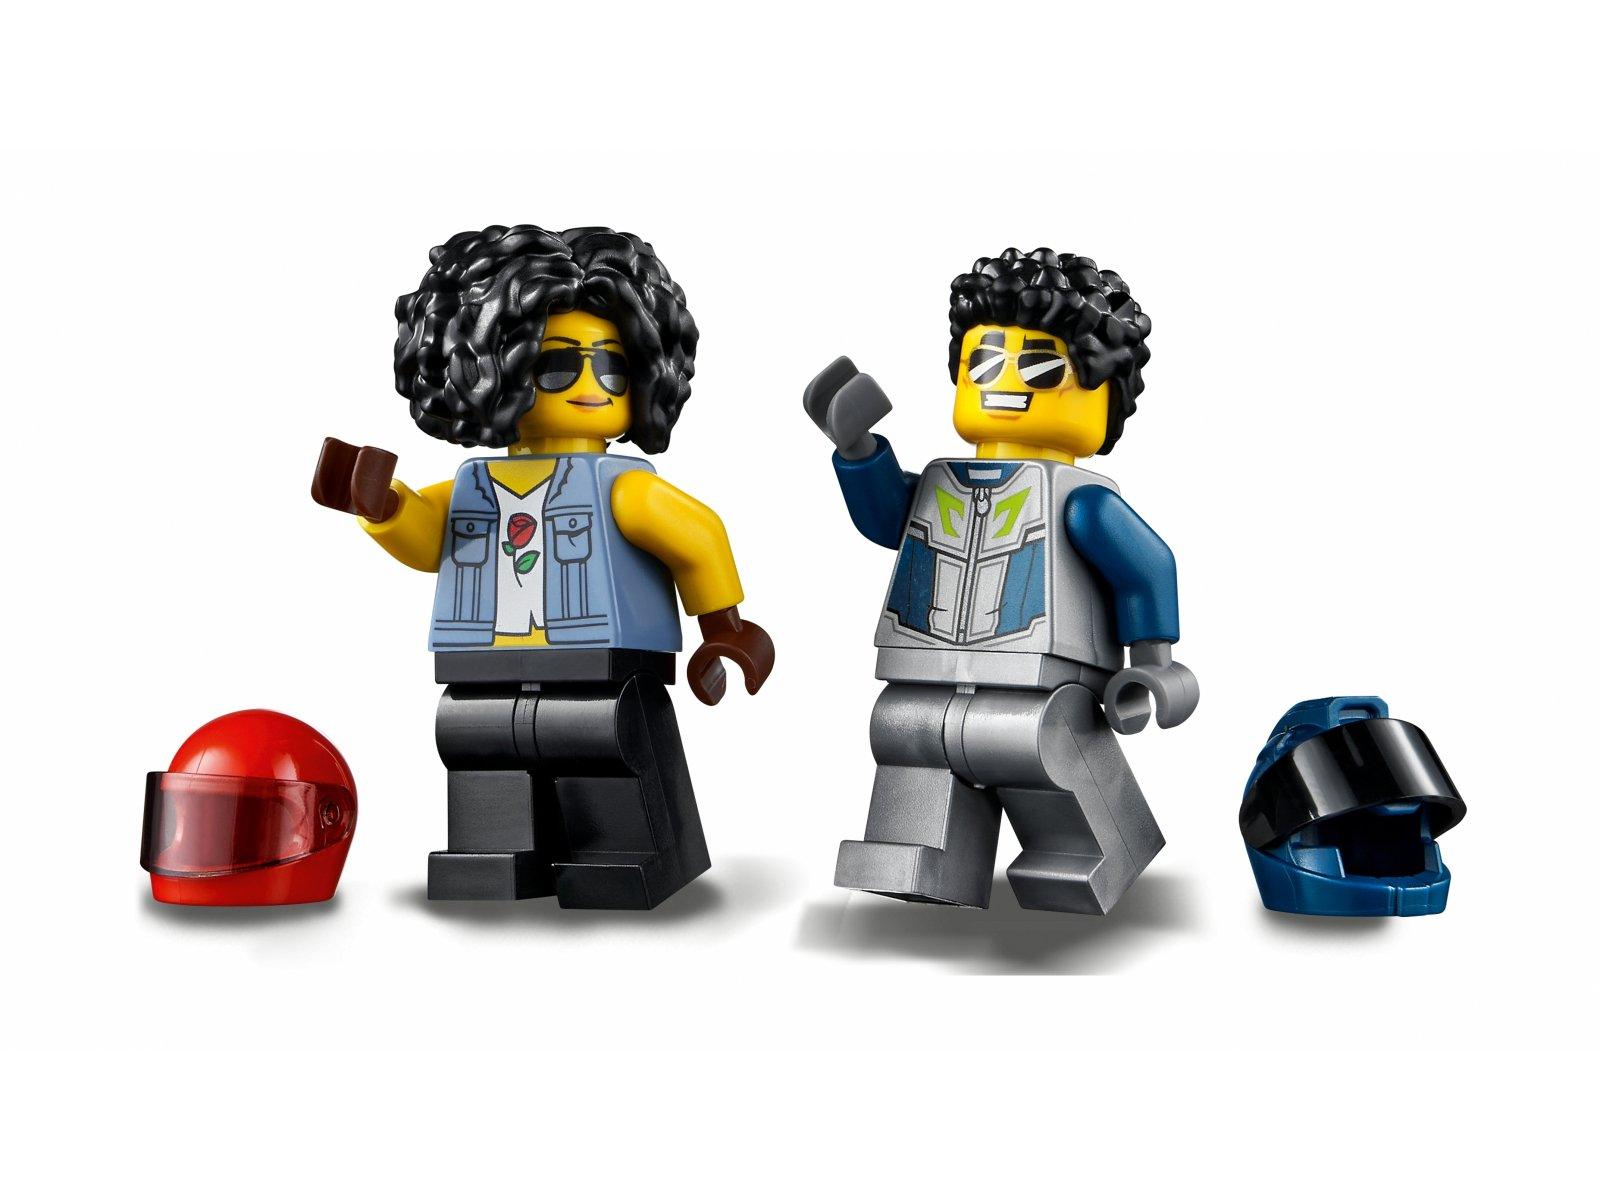 LEGO 60299 Konkurs kaskaderski